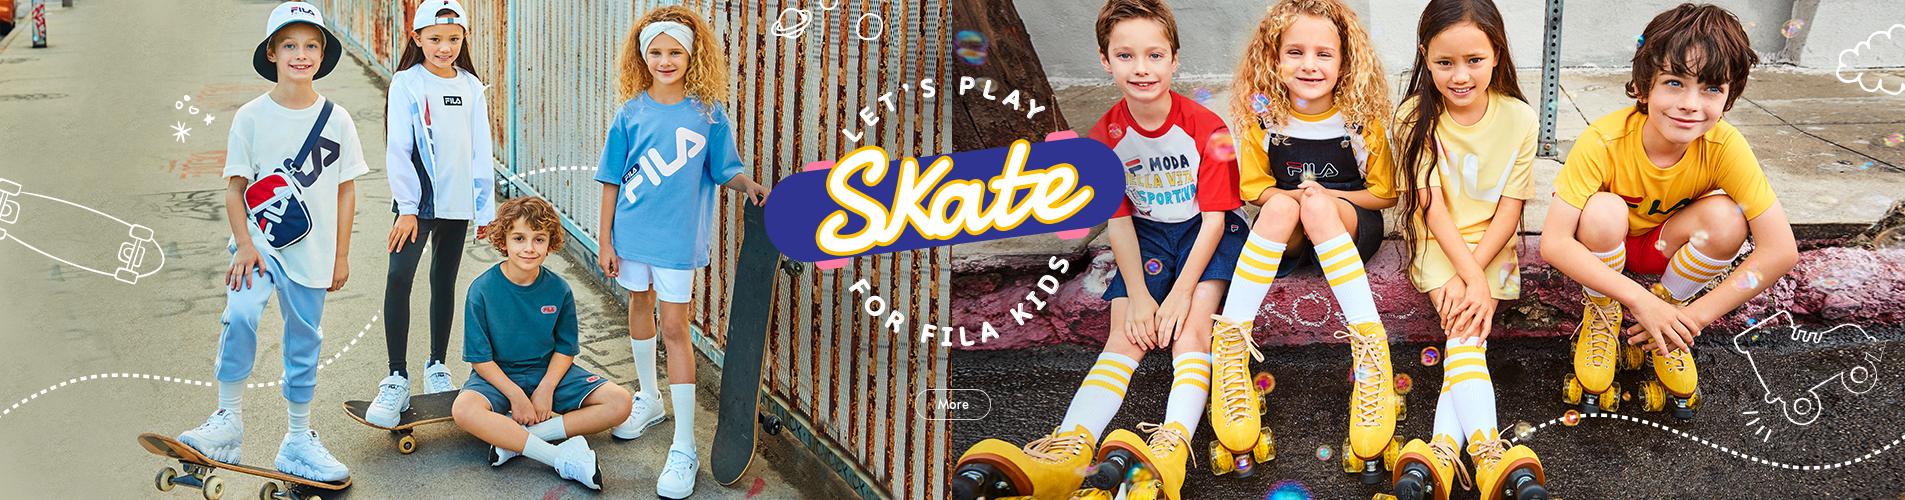 LET'S PLAY SKATE FOR FILA KIDS